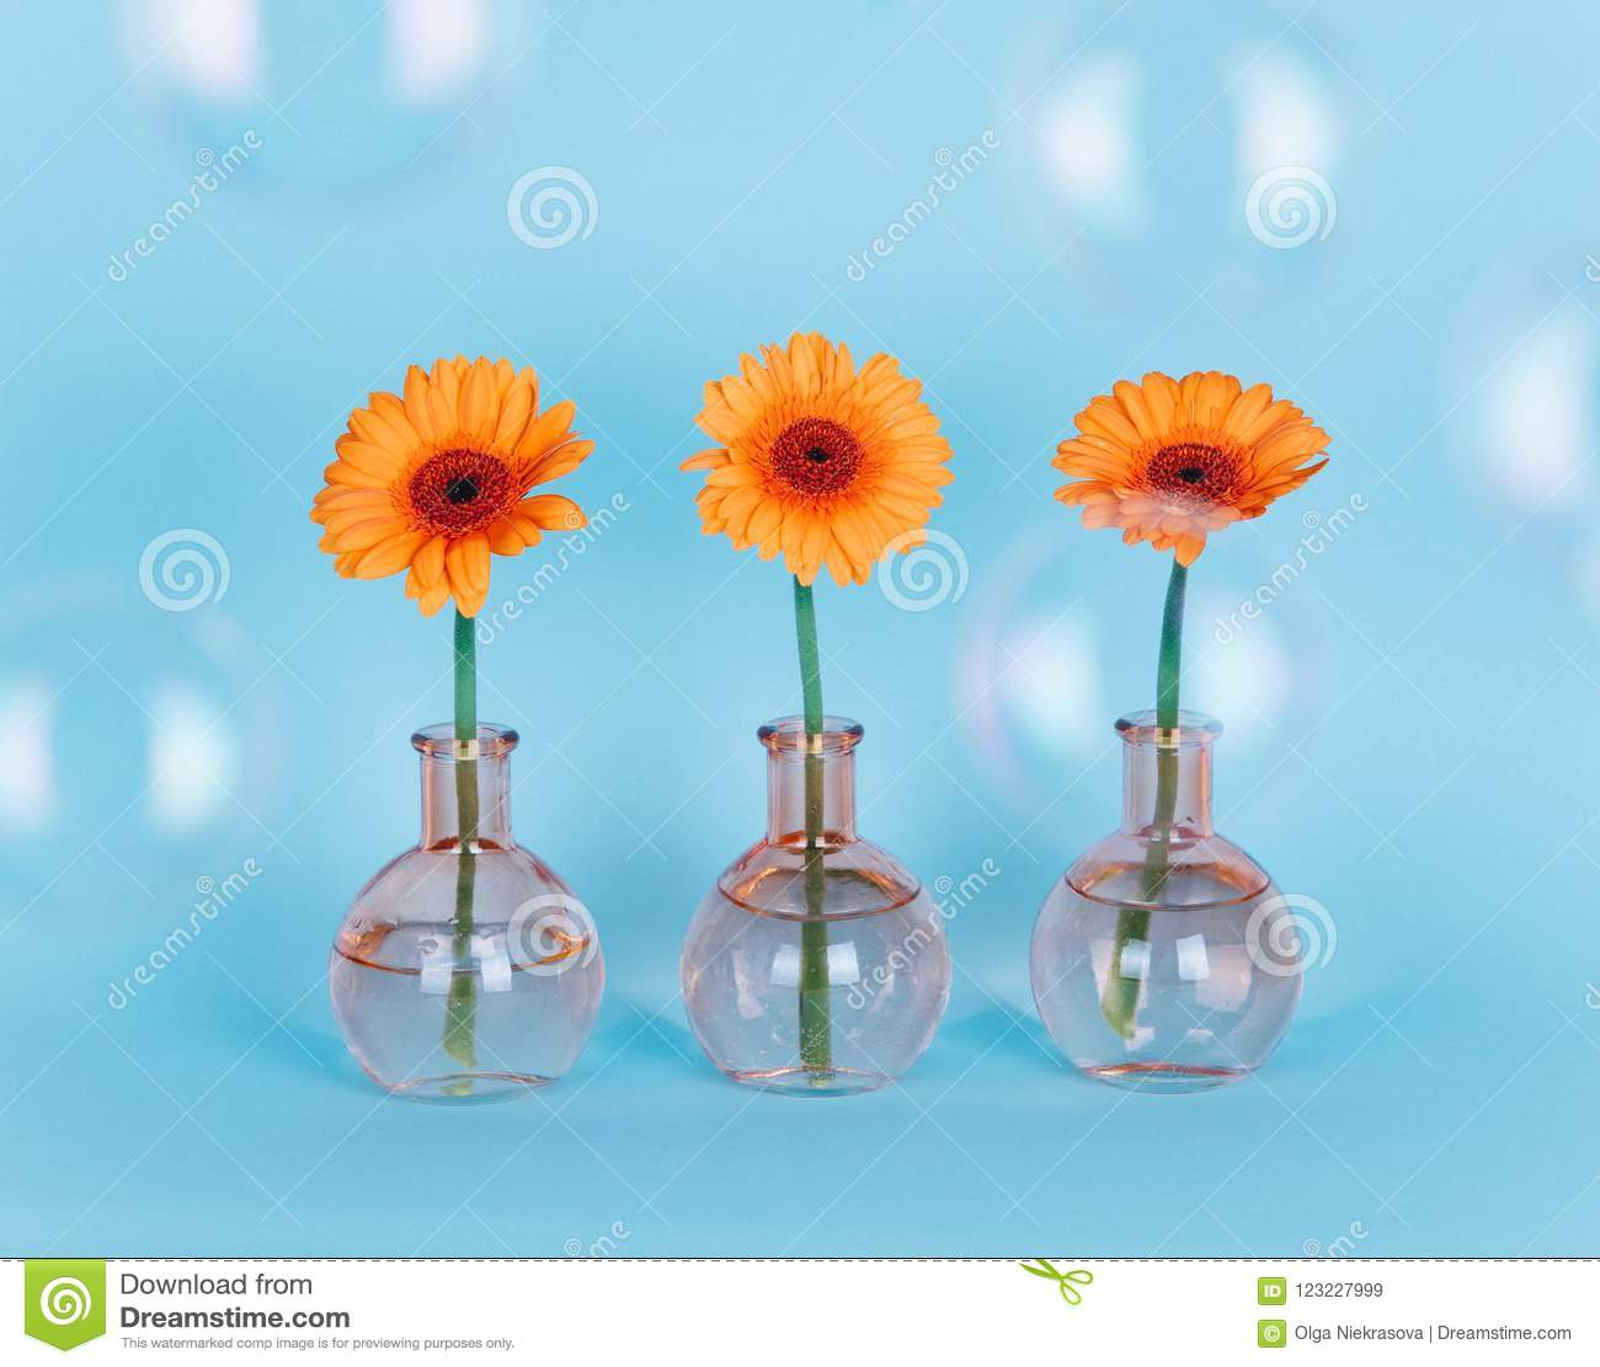 Orange Daisy Flower In A Vase On Trendy Background. Stock ...